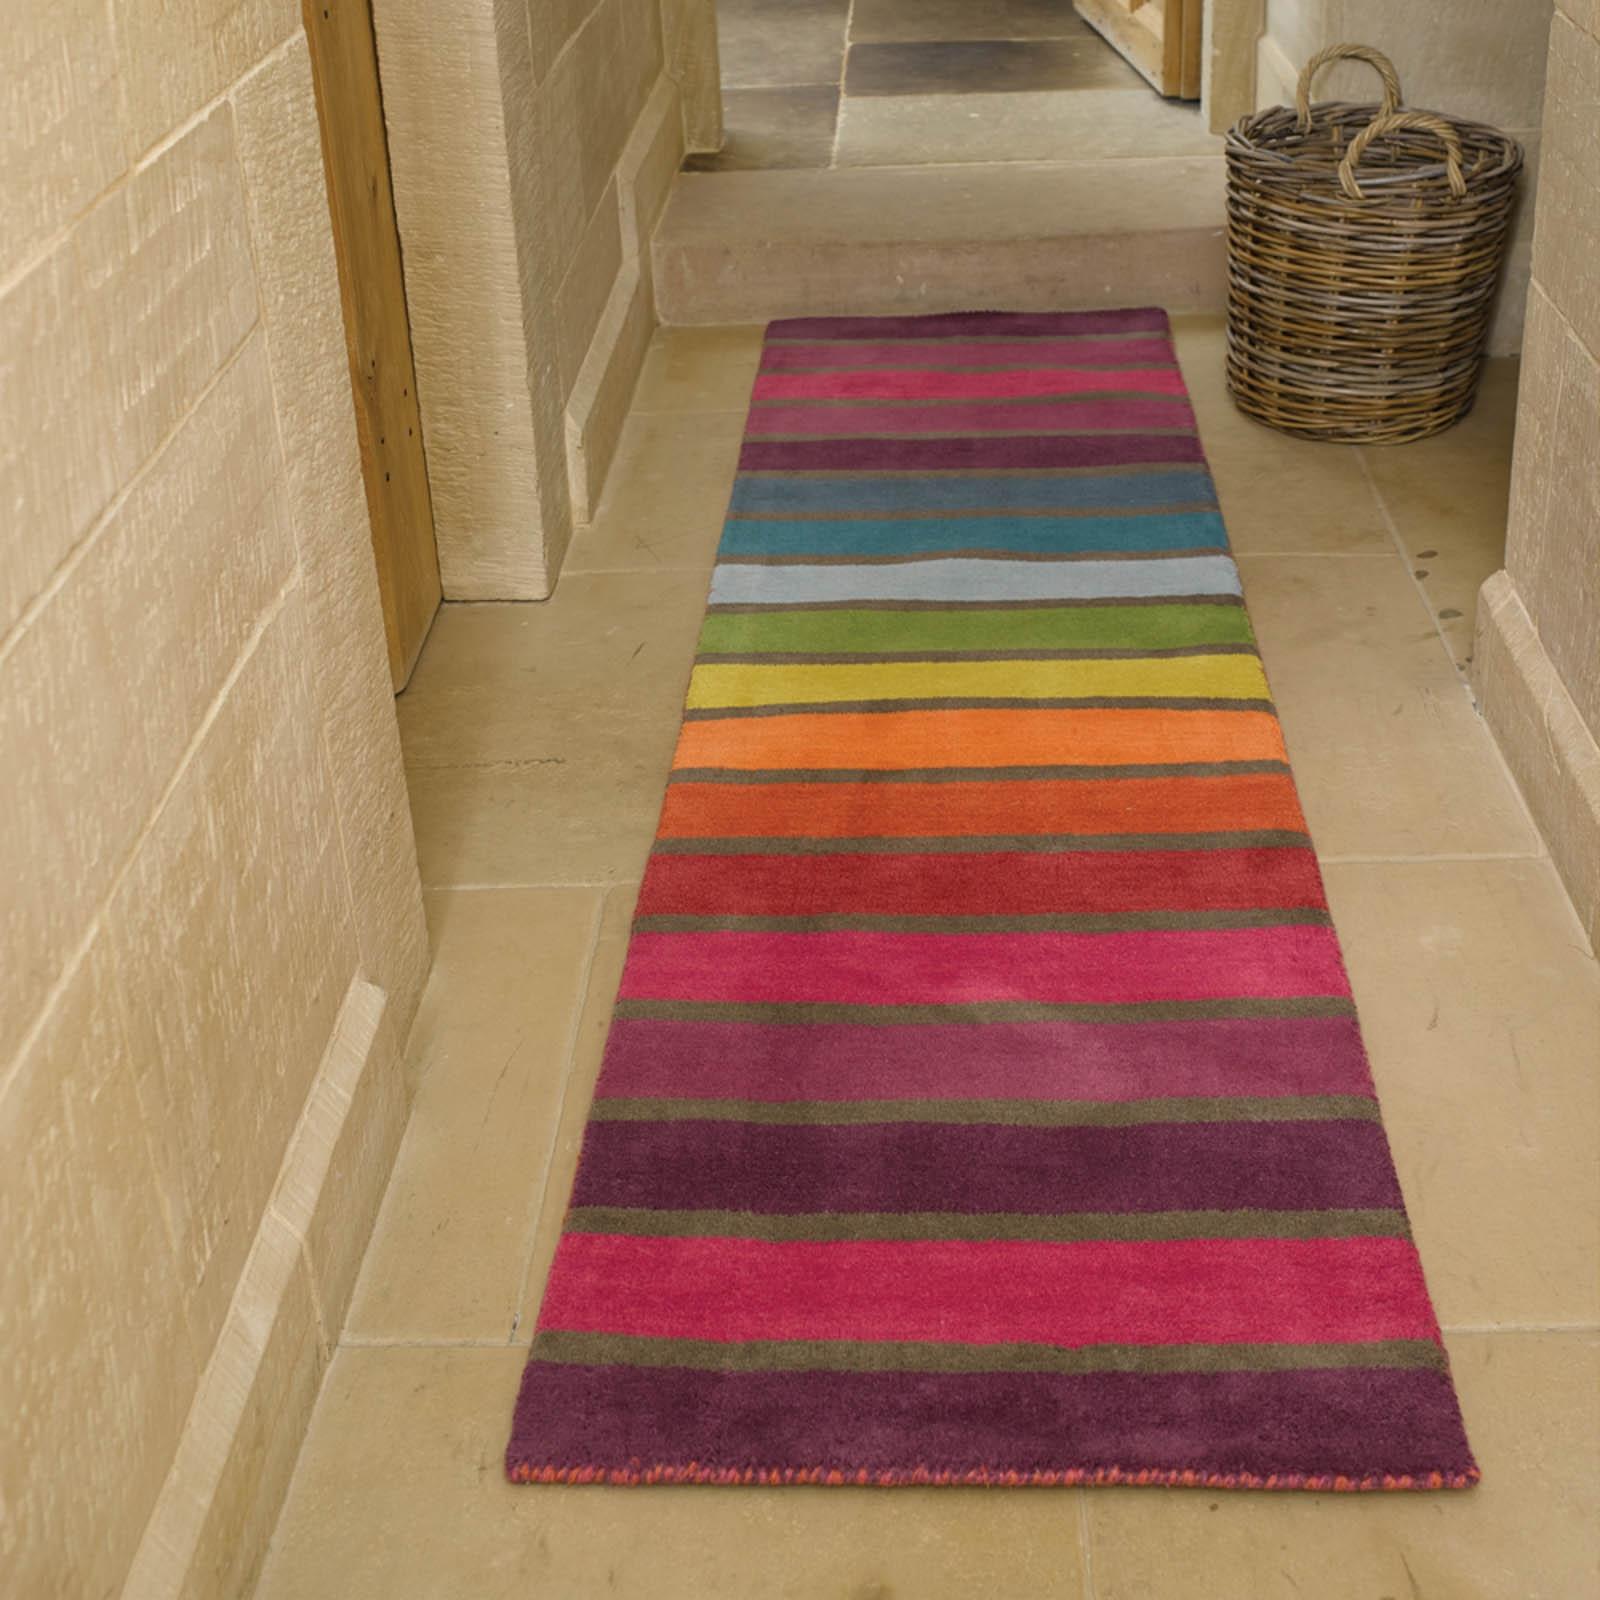 Flooring Lovely Hallway Runners For Floor Decor Idea Pertaining To Modern Runner Rugs For Hallway (View 12 of 20)